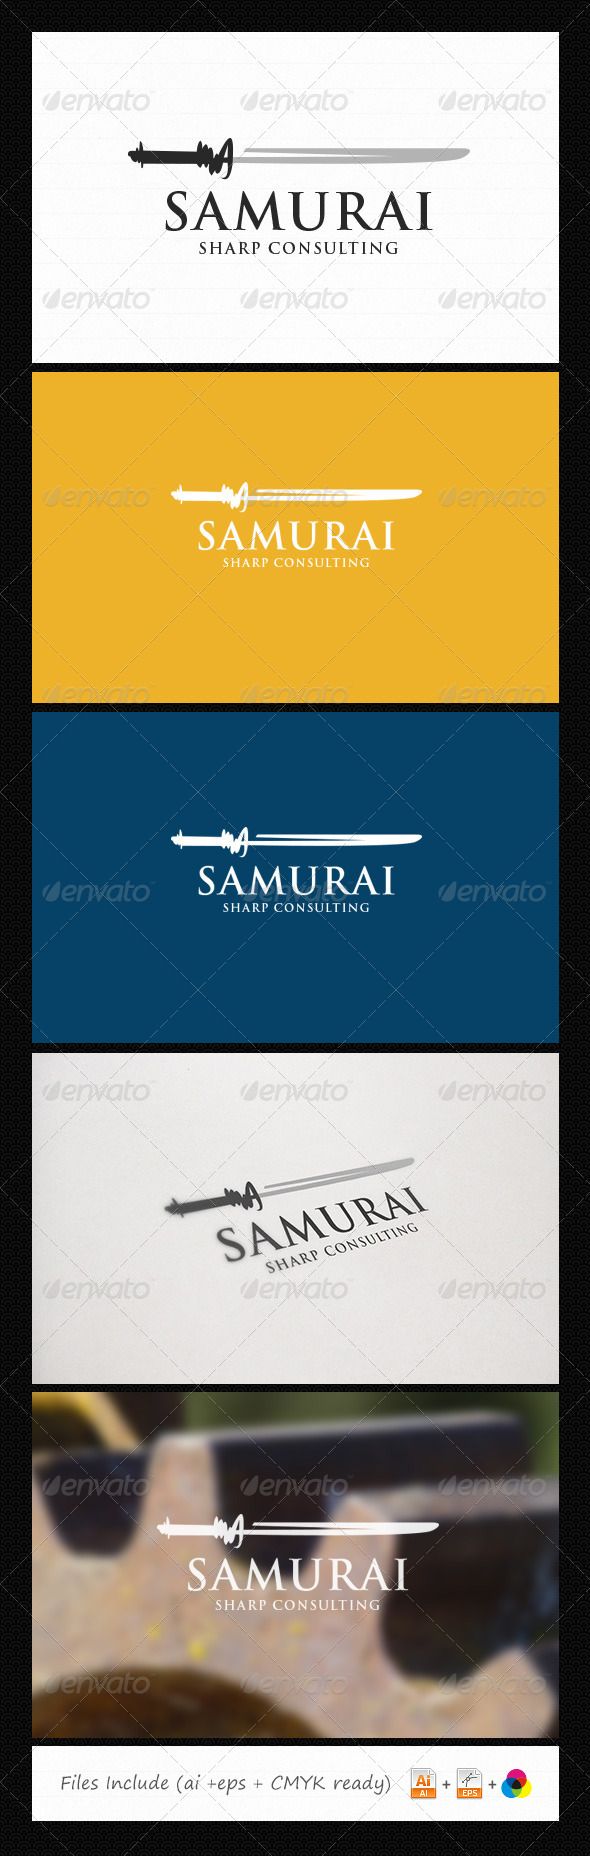 GraphicRiver Samurai Consulting Logo 6058114